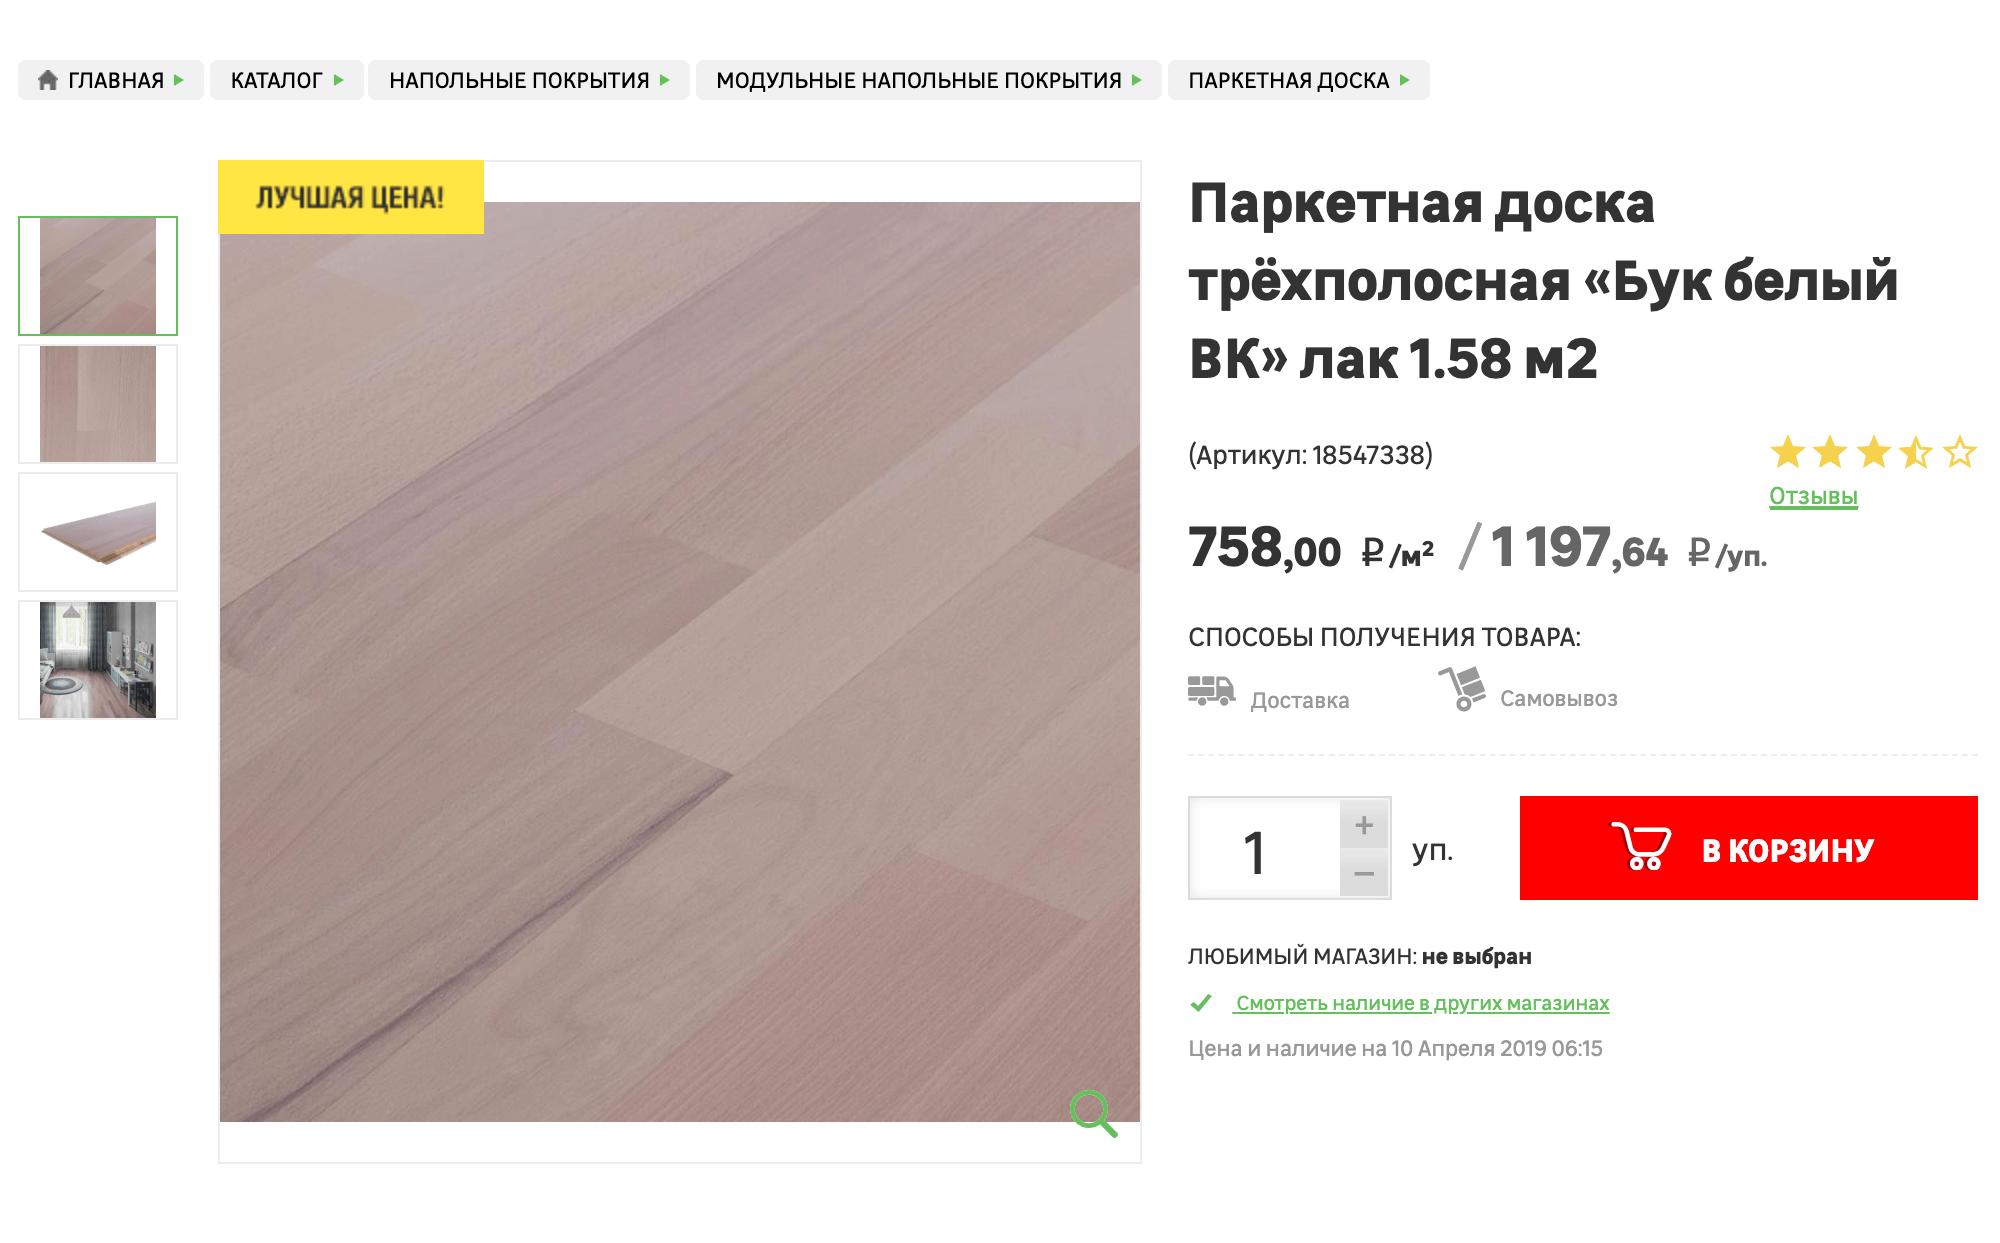 Цена за 1 м² паркетной доски начинается от 758 р.